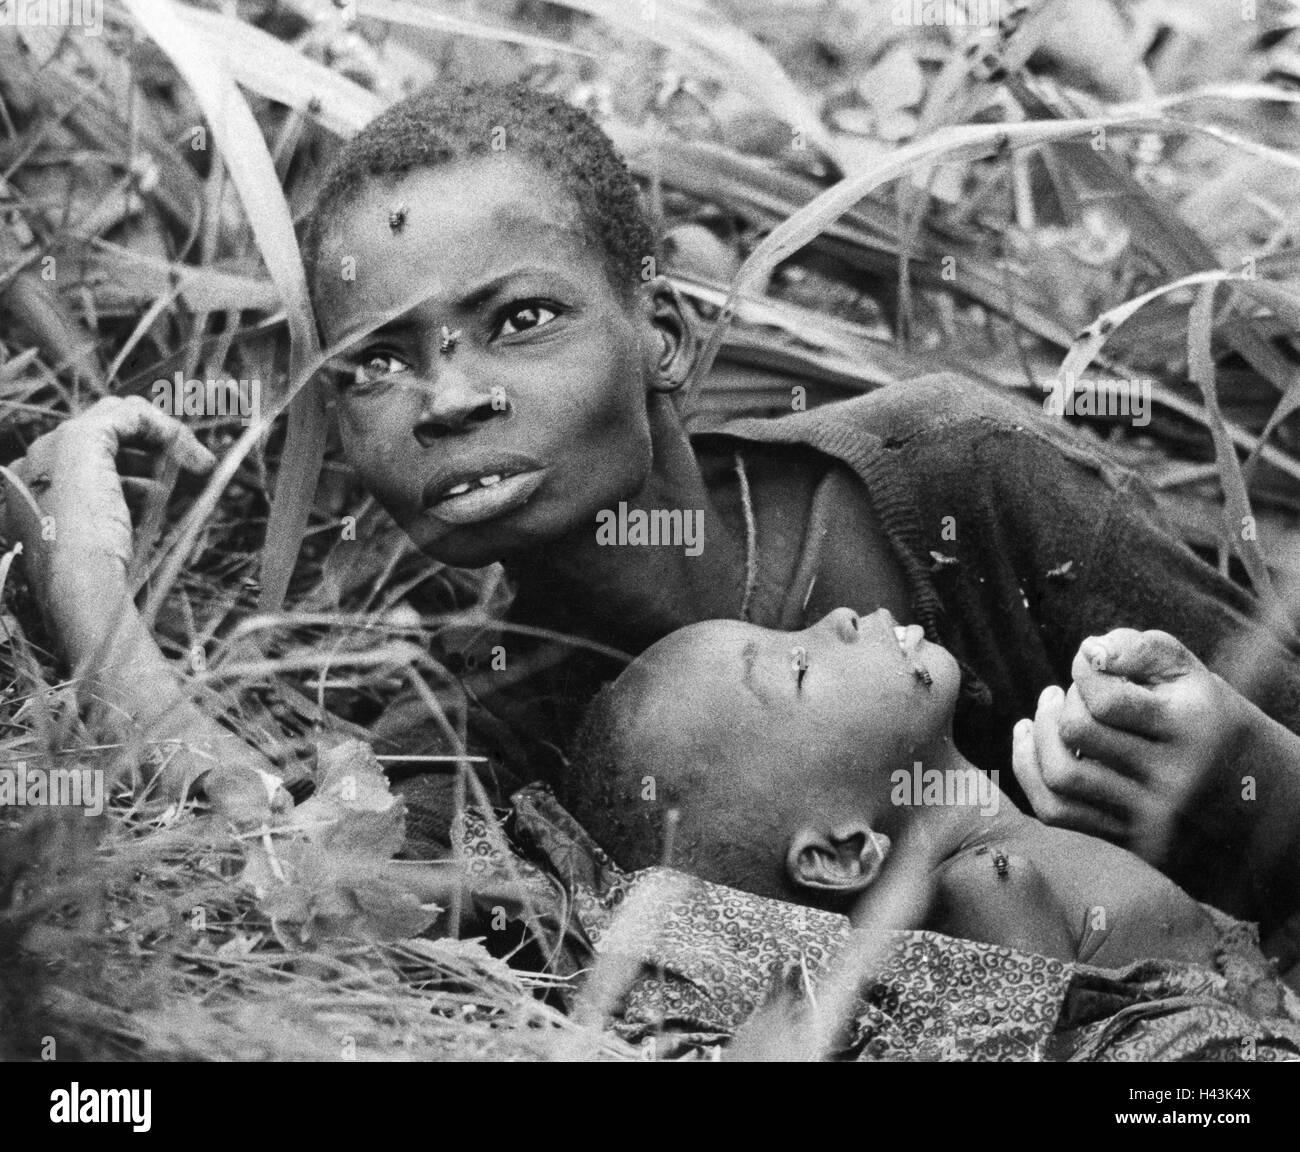 Nigeria, Biafra, 1968, mother, child, emaciated, lying, portrait, - Stock Image